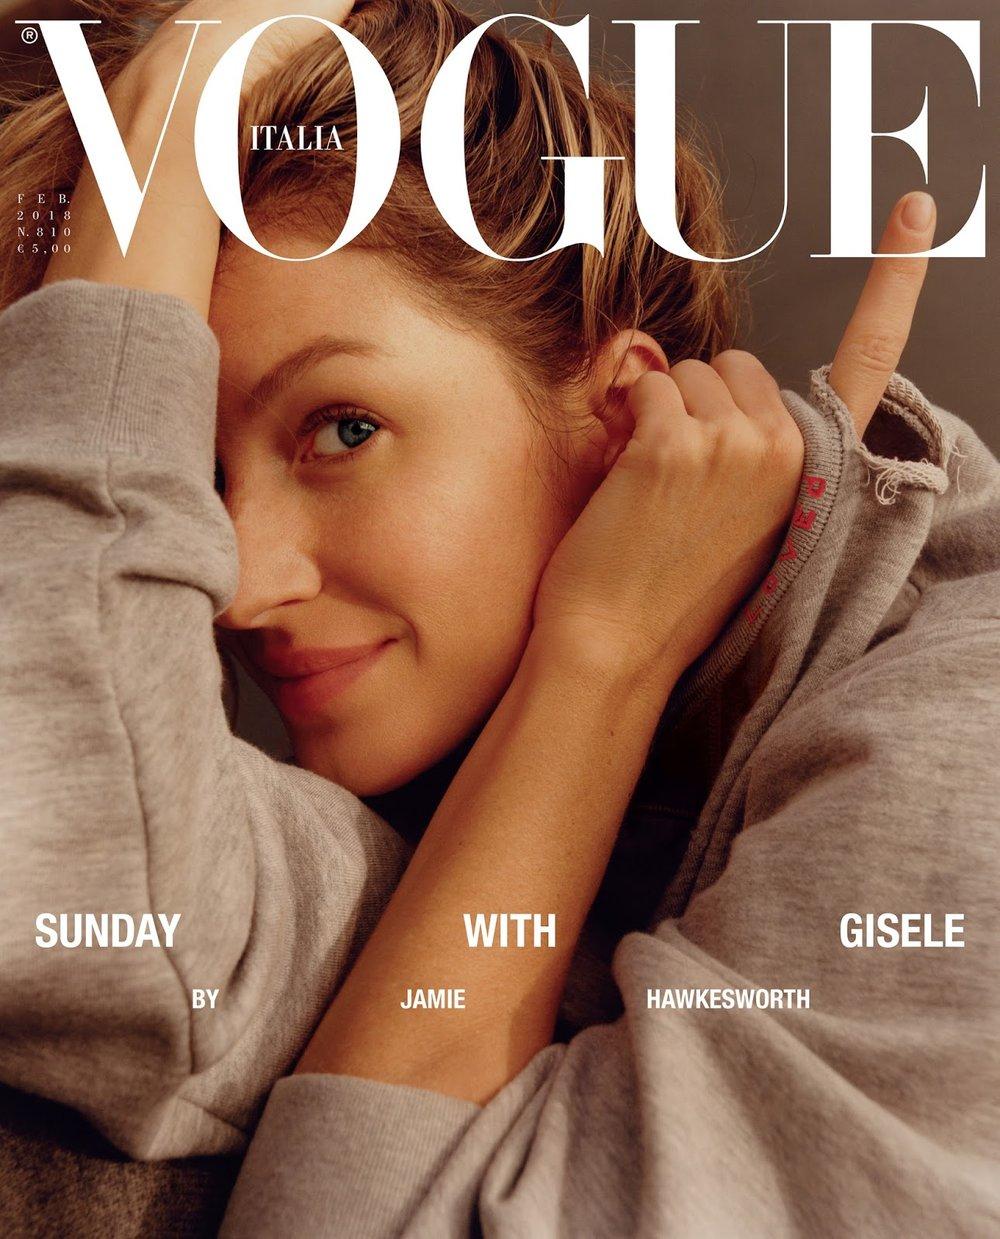 Vogue Italia February 2018 2.jpg